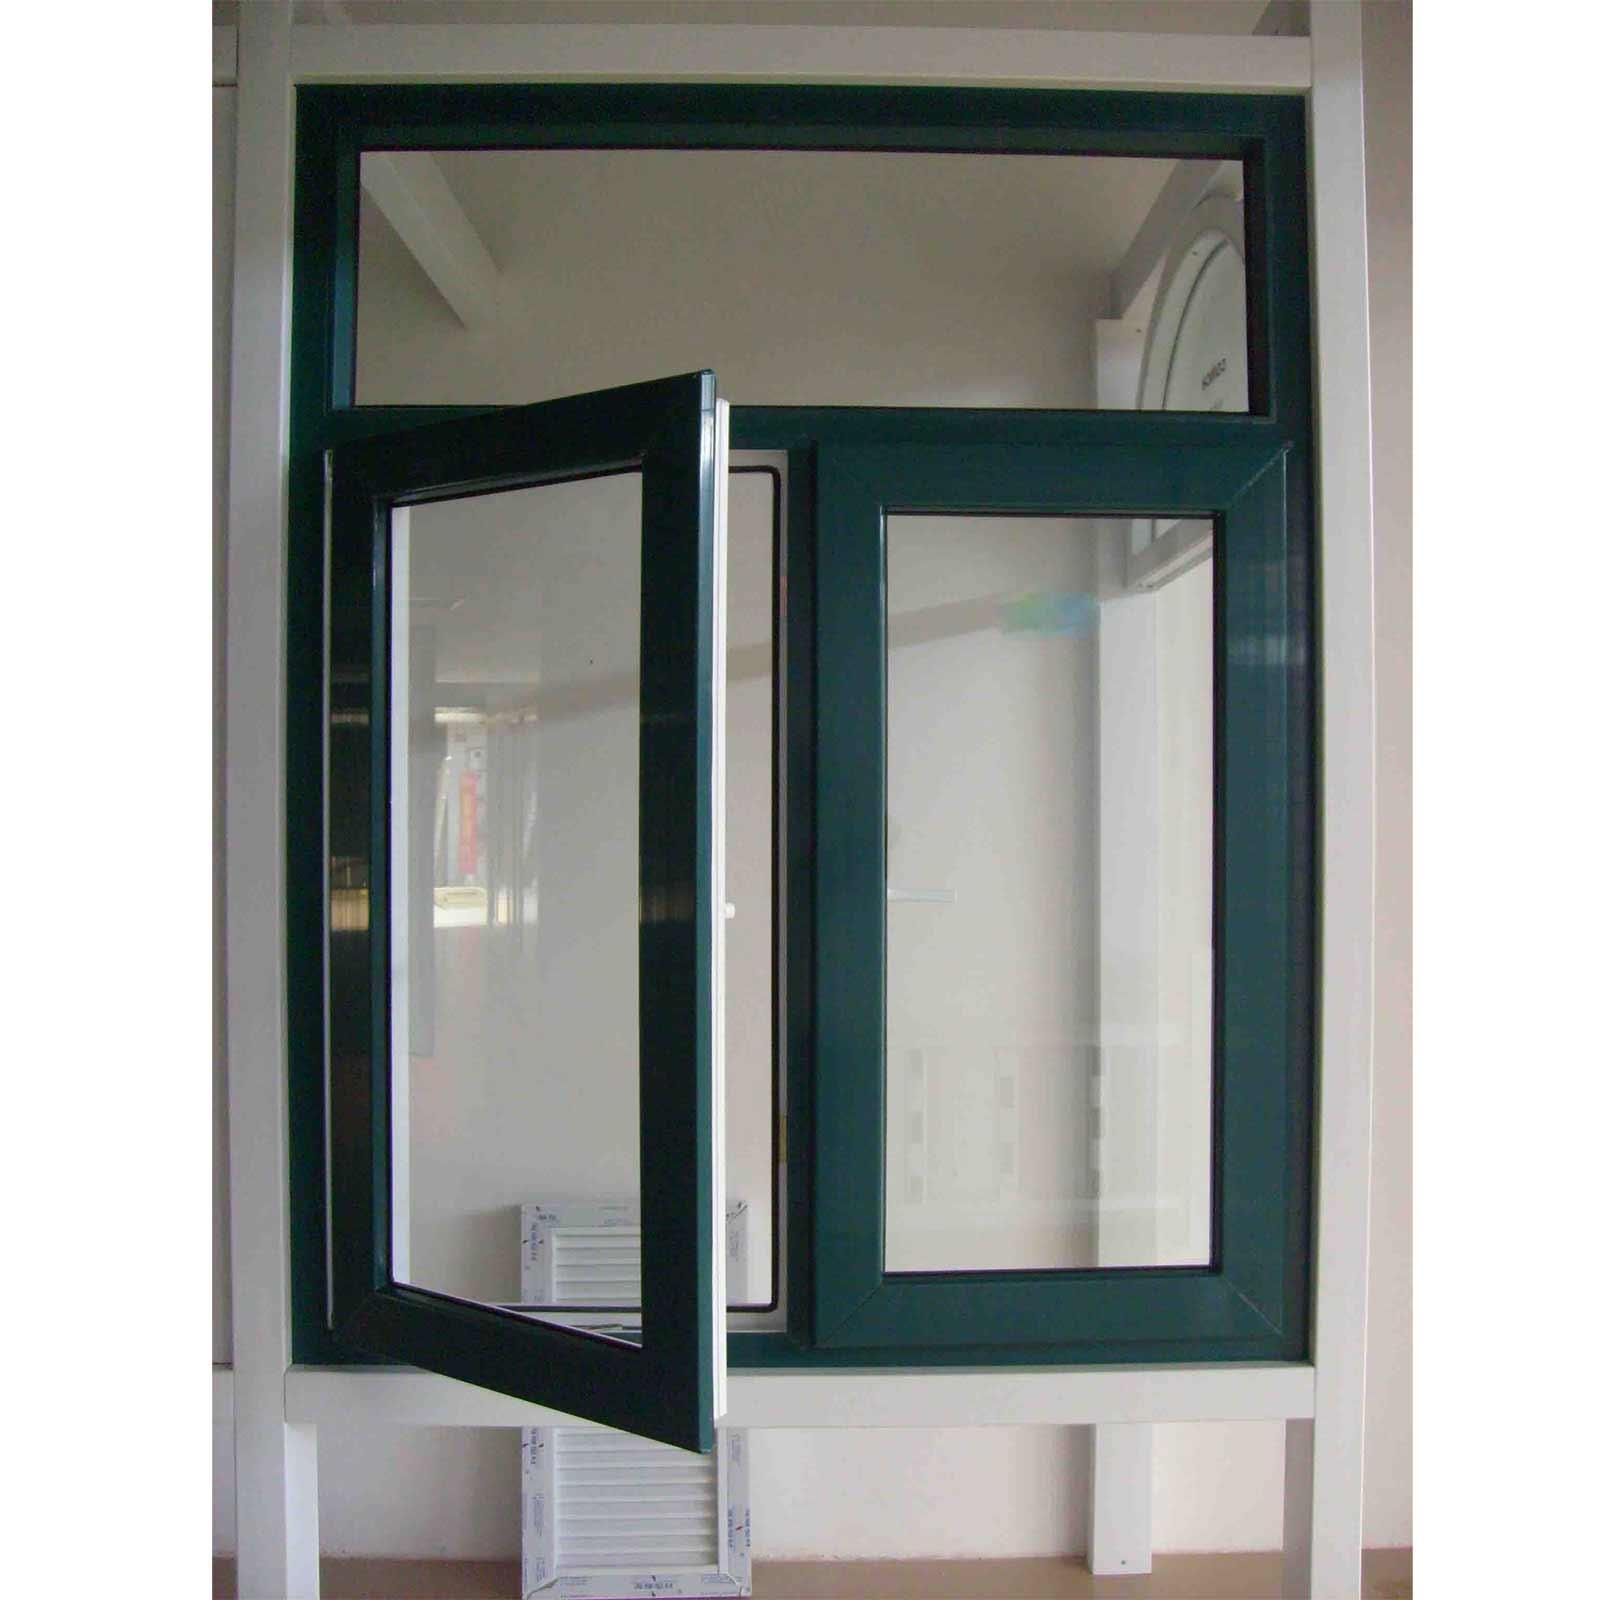 French casement windows - Aluminum Casement Window Drawing Buy Aluminum Casement Window Drawing Aluminium Casement Window Casement Window Drawing Product On Alibaba Com